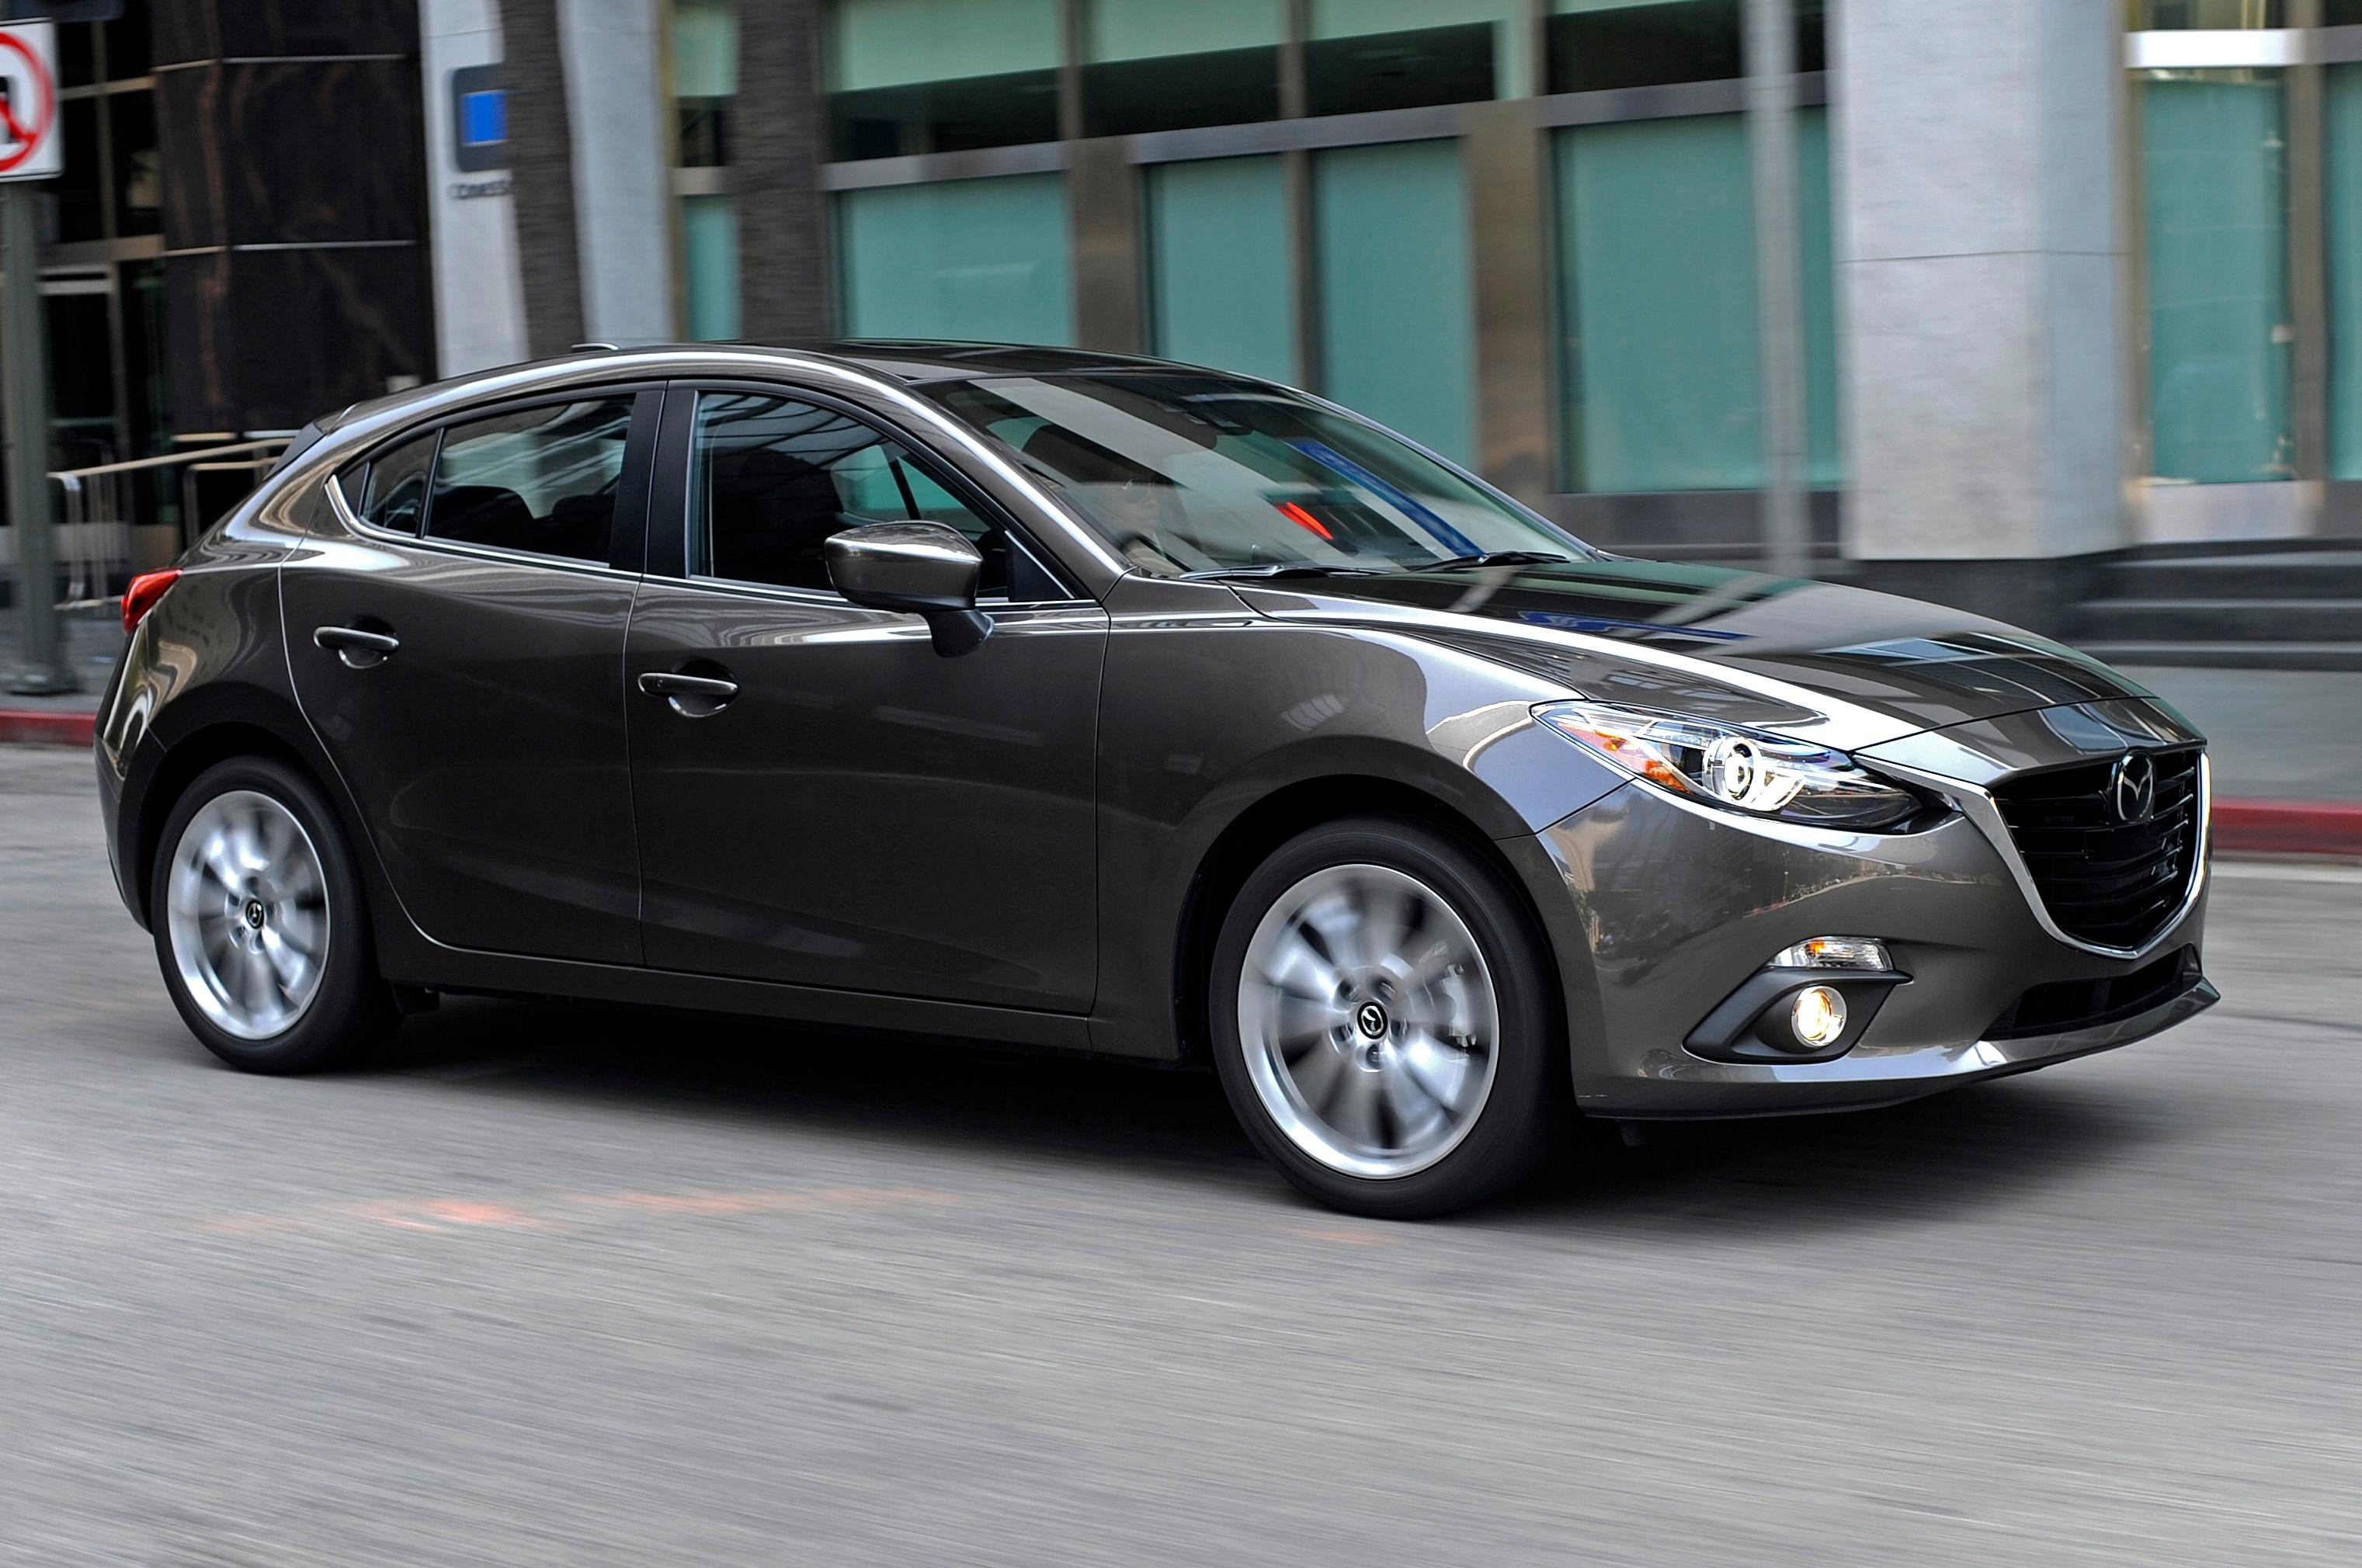 2014 Mazda 3 Profile12